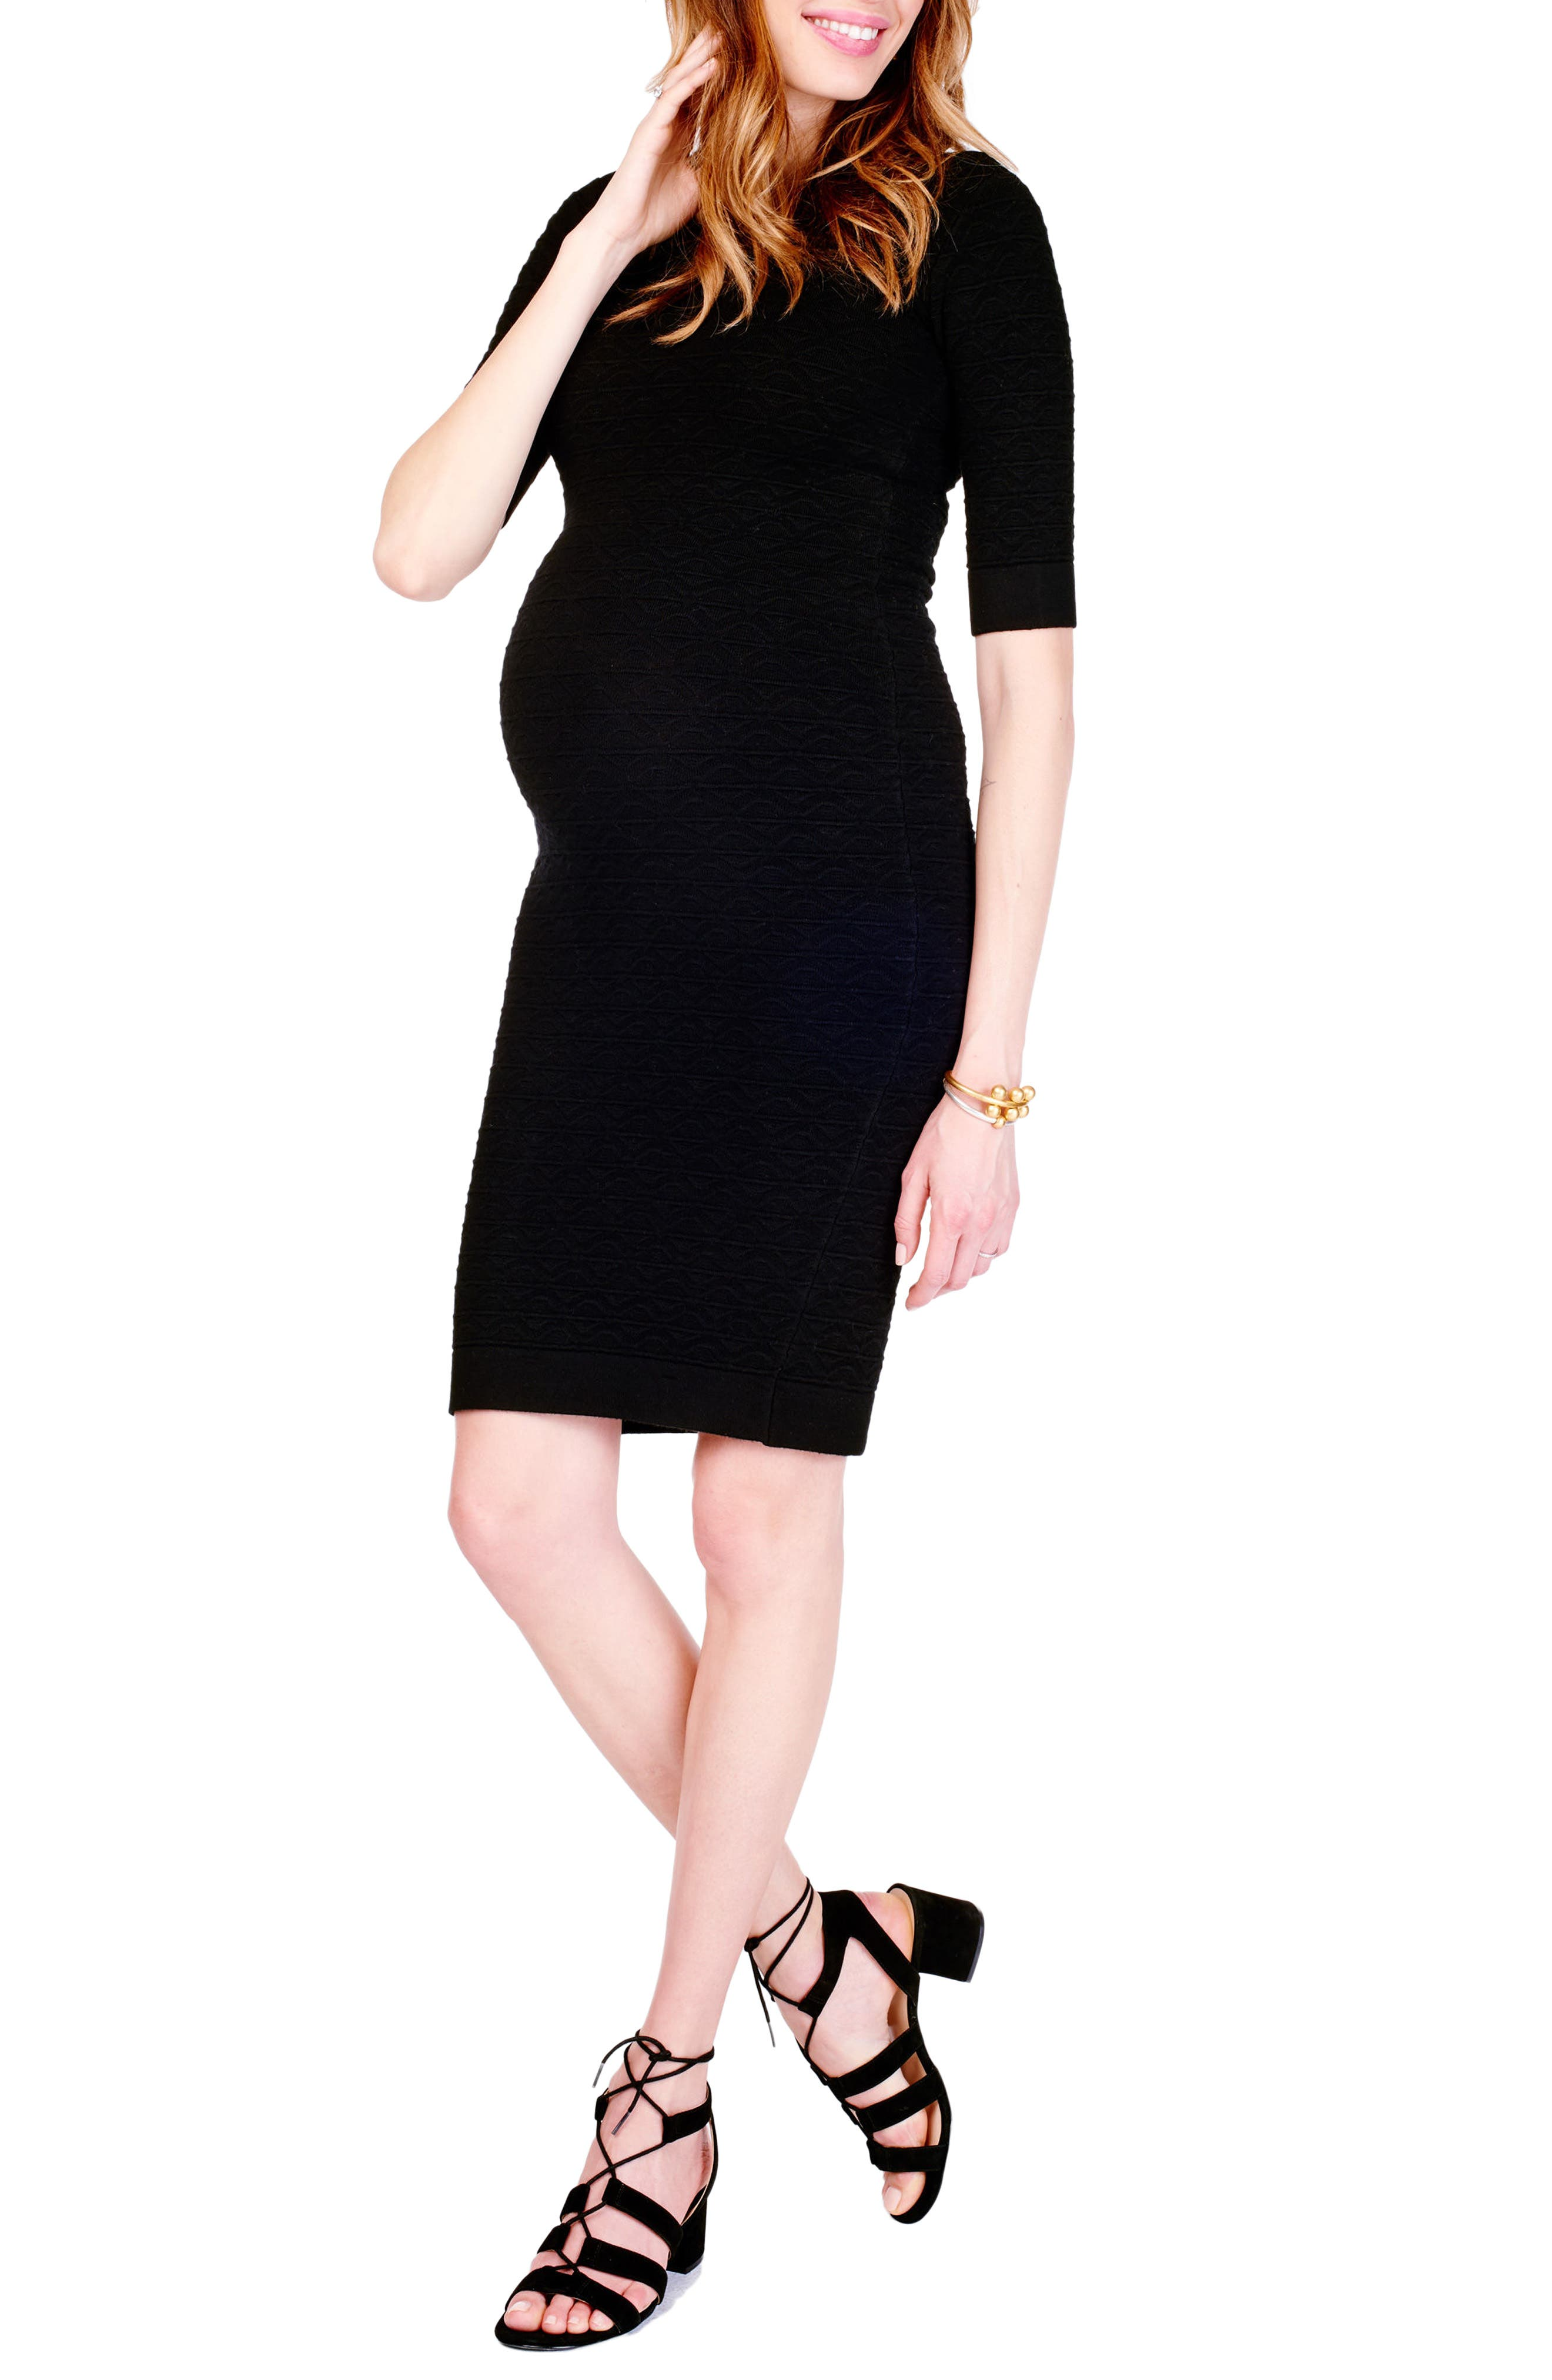 Sweater Knit Maternity Sheath Dress,                         Main,                         color, Jet Black